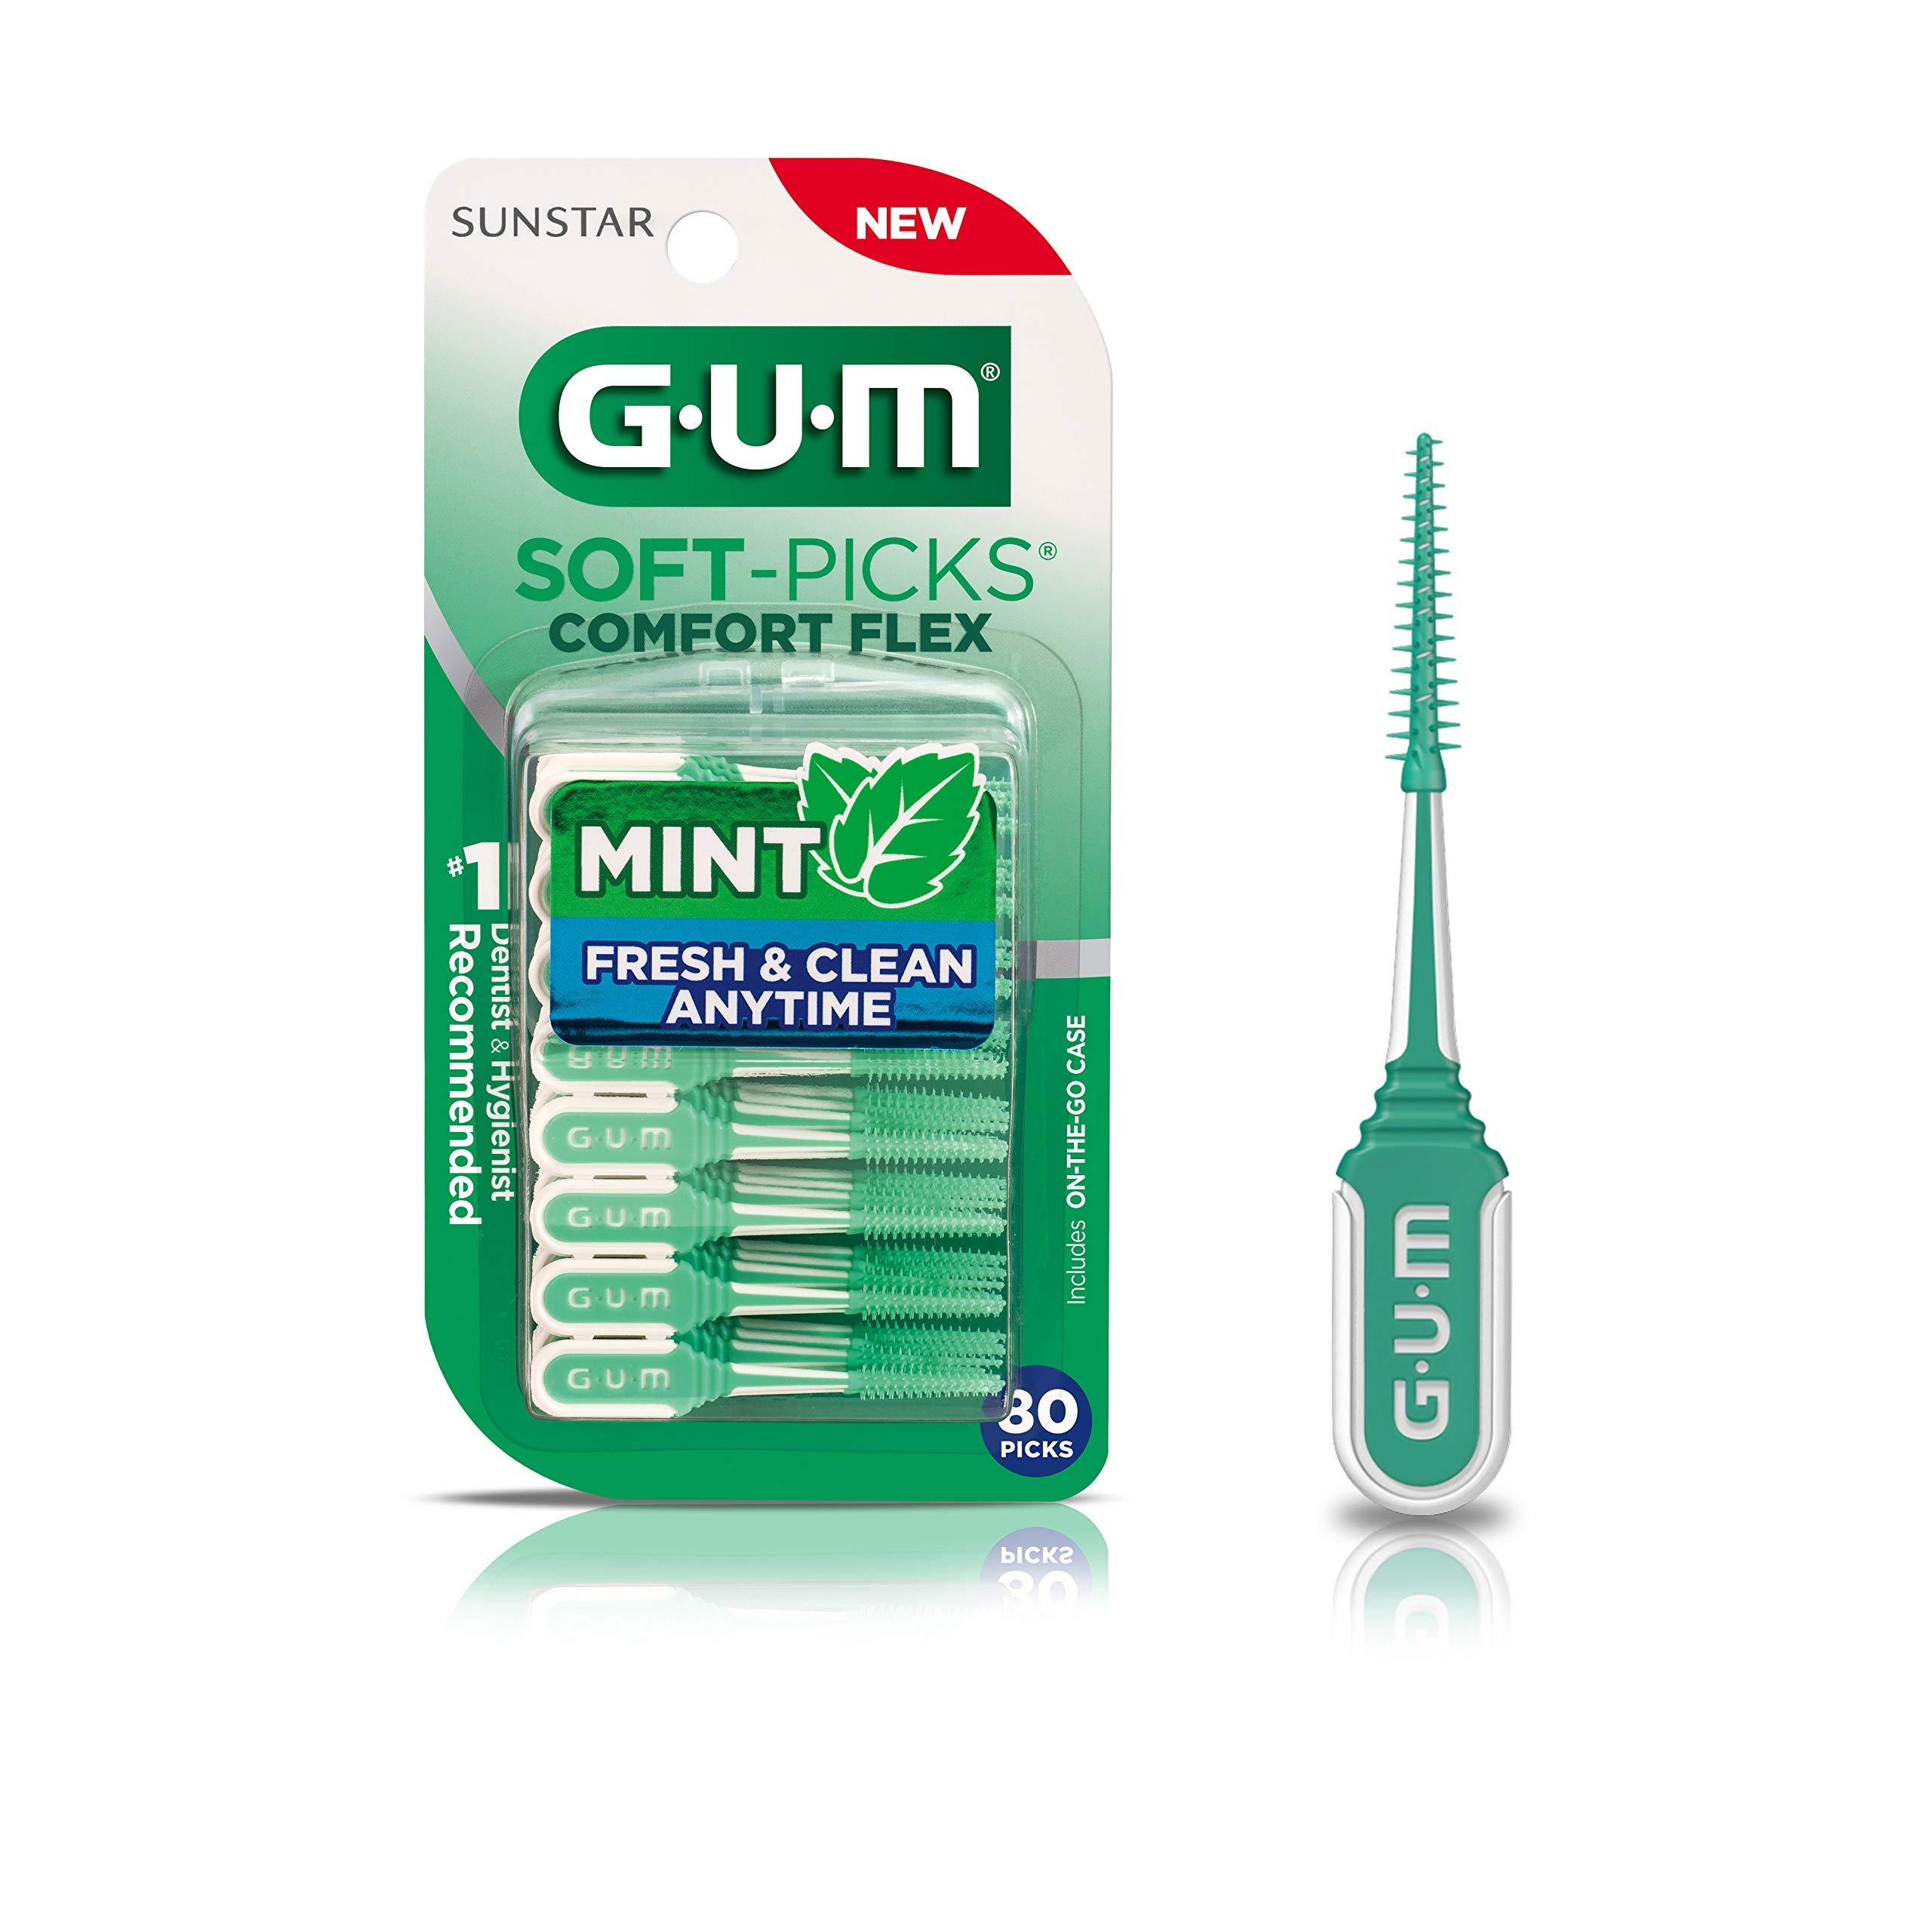 GUM-6705R Soft-Picks Comfort Flex Mint Dental Picks, New Invigorating Mint Flavor, 80 Count